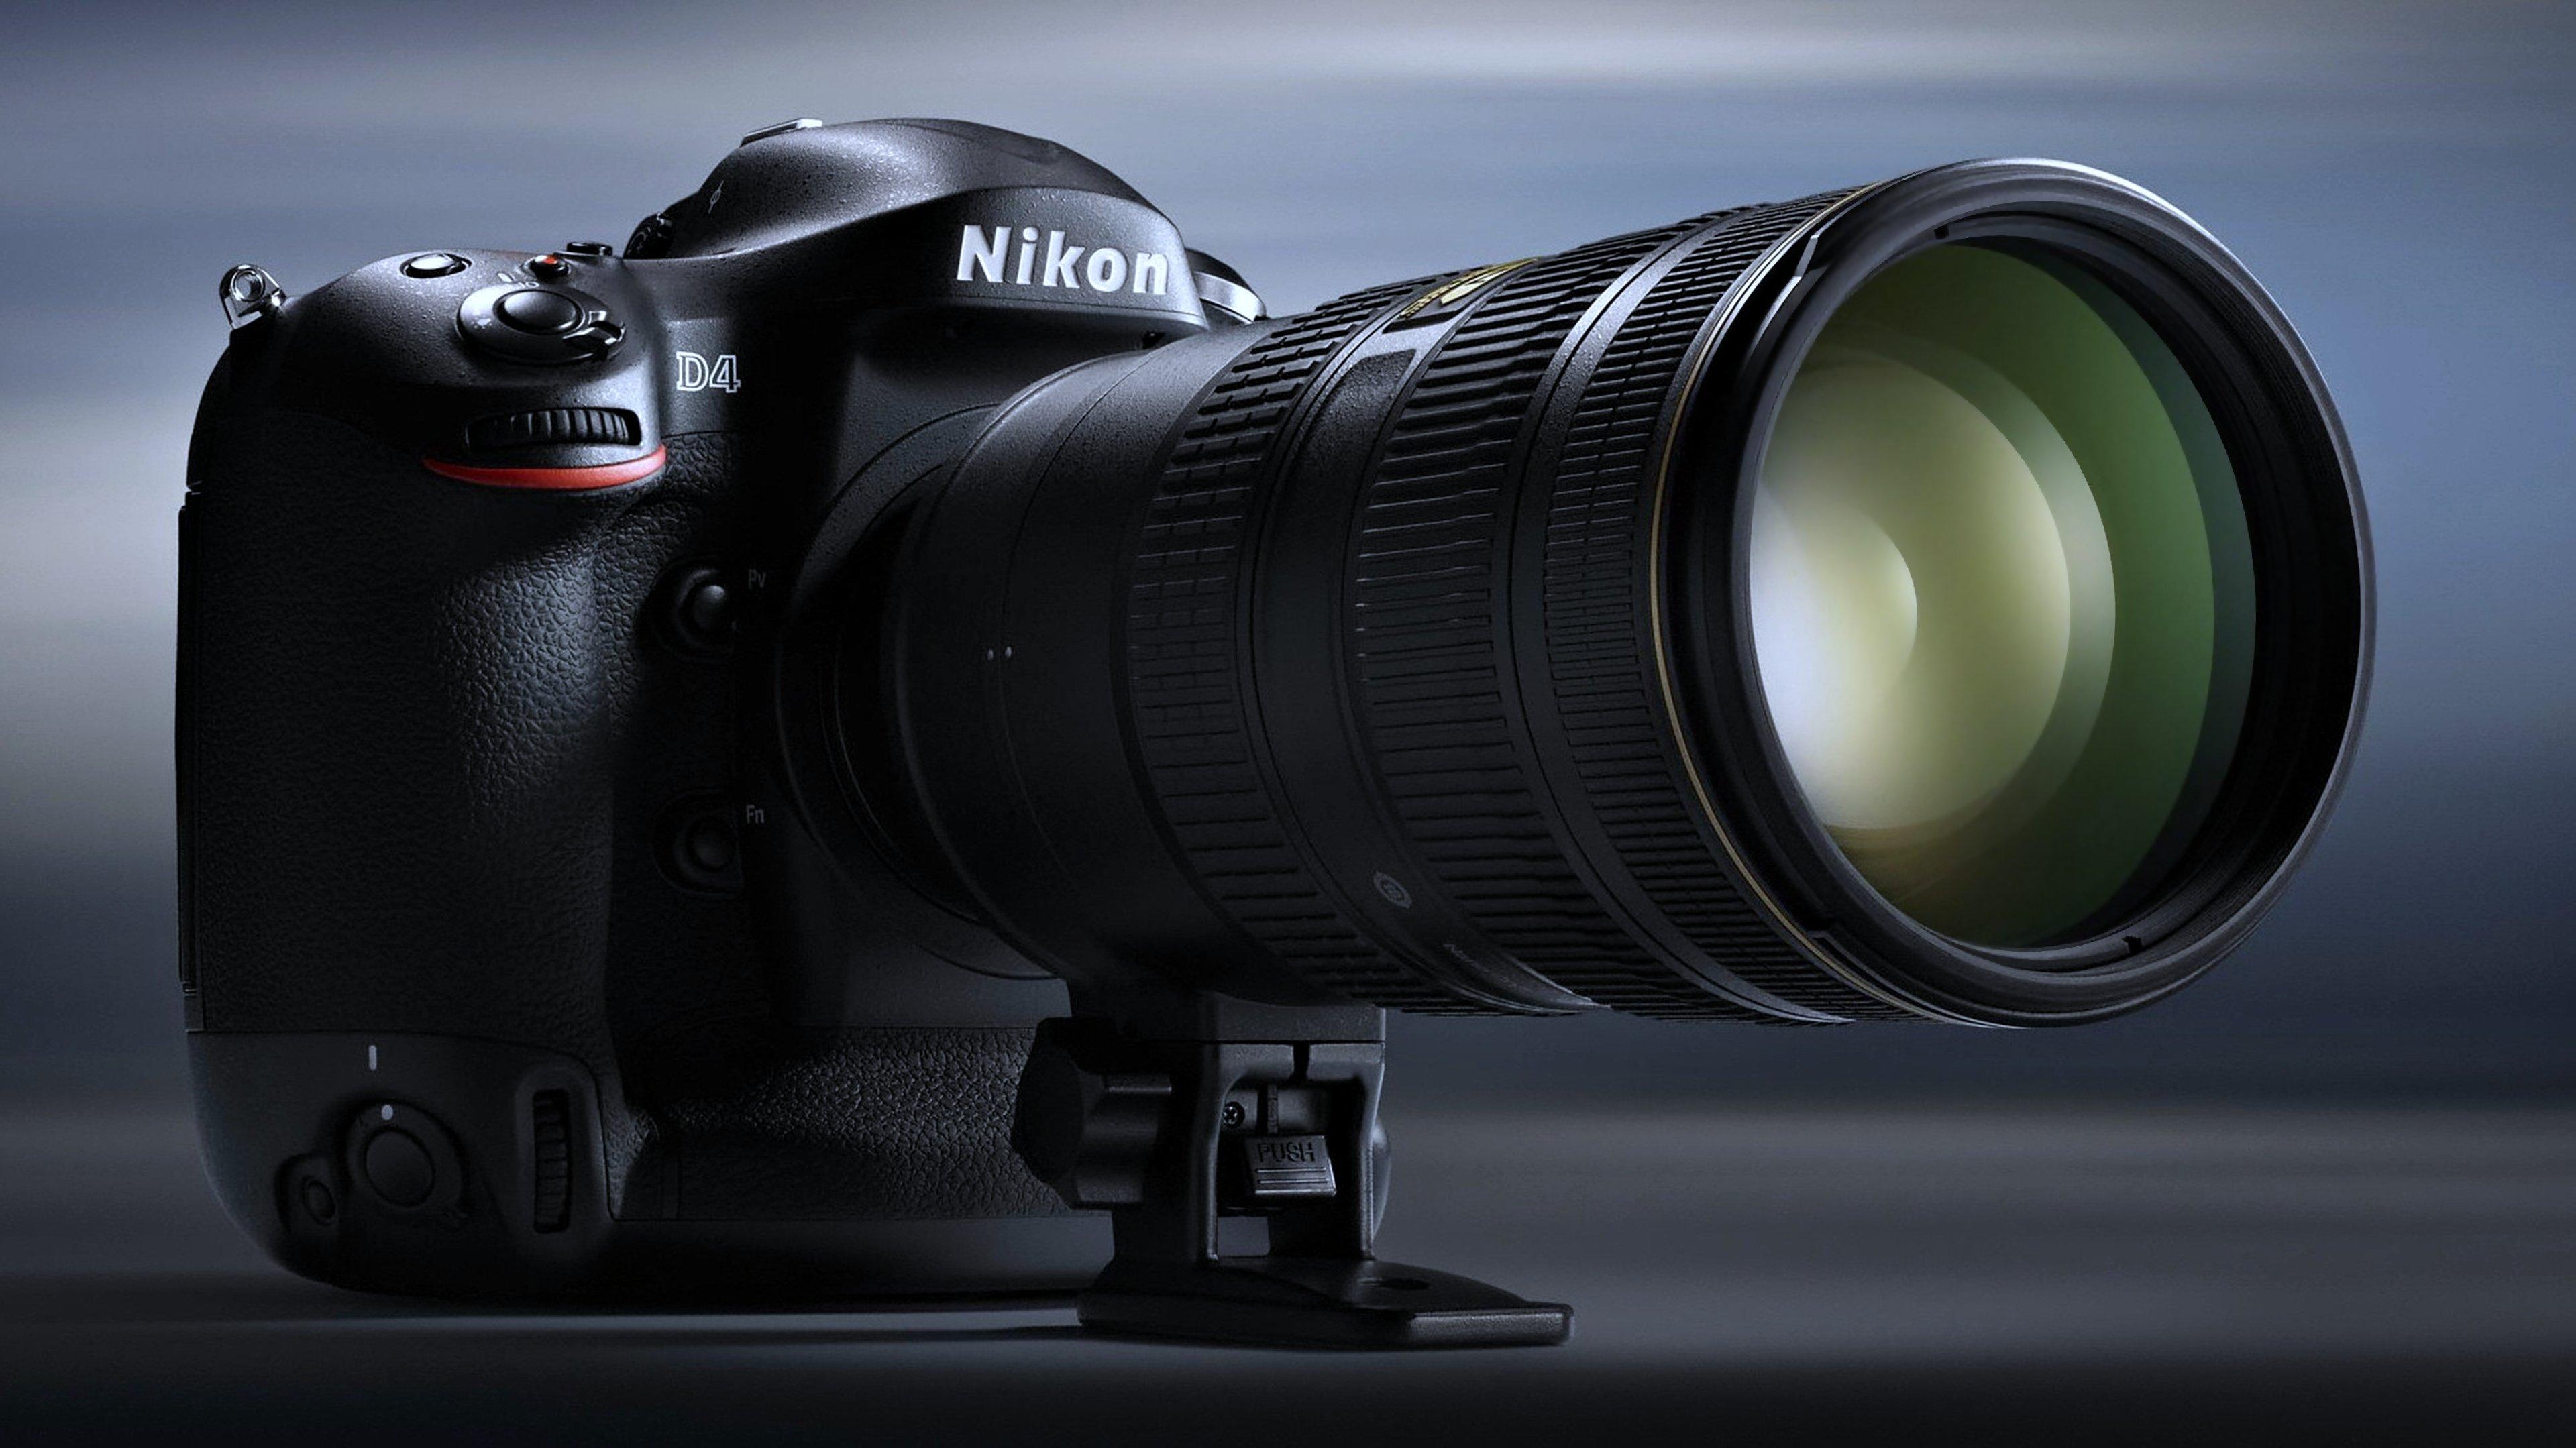 Nikon D4 Camera Photos Technology Wallpaper Nikon Dslr Camera Hd 3840x2159 Download Hd Wallpaper Wallpapertip